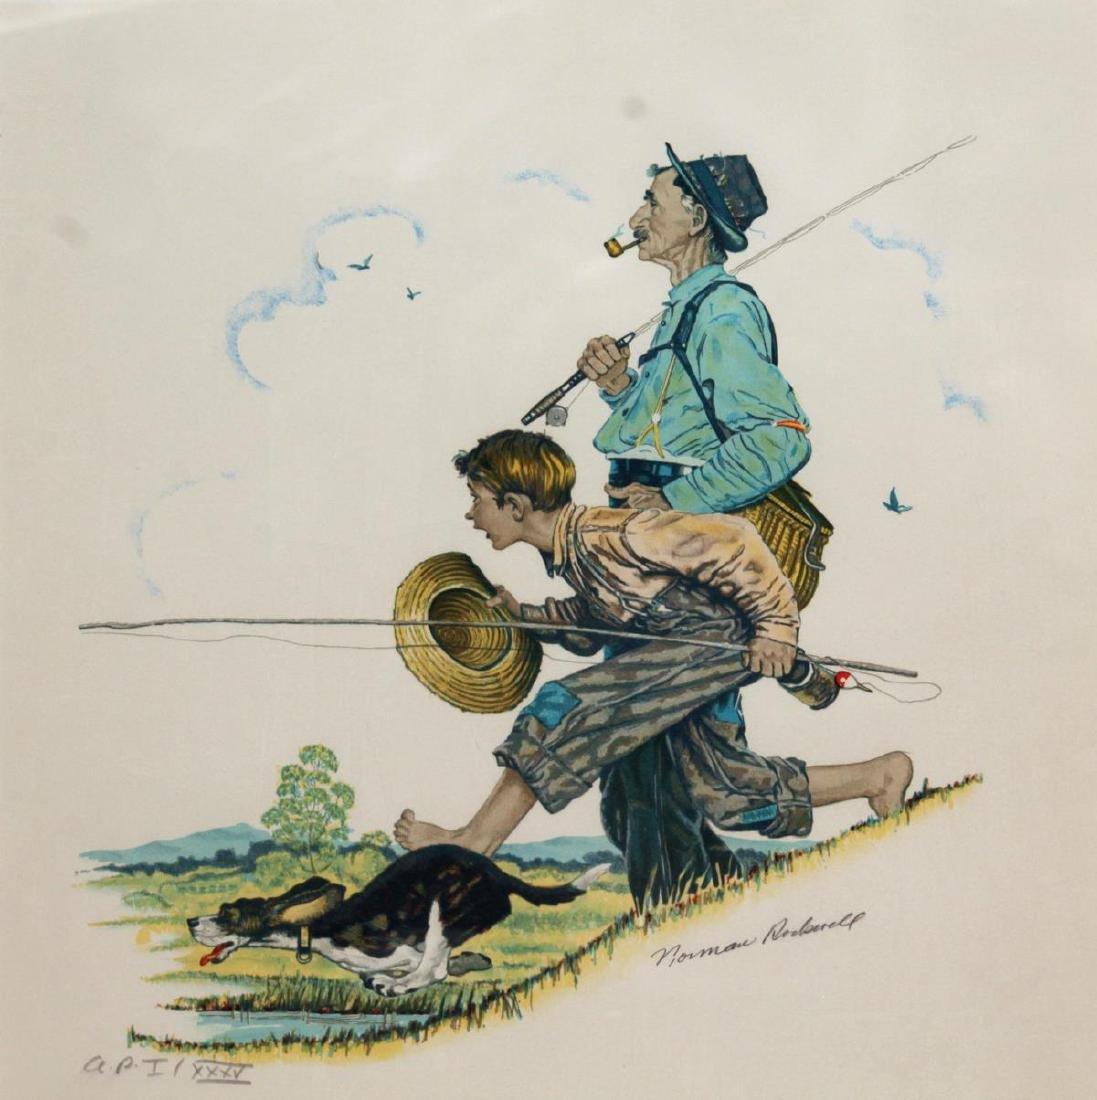 Norman Rockwell - Grandpa and Me: Fishing